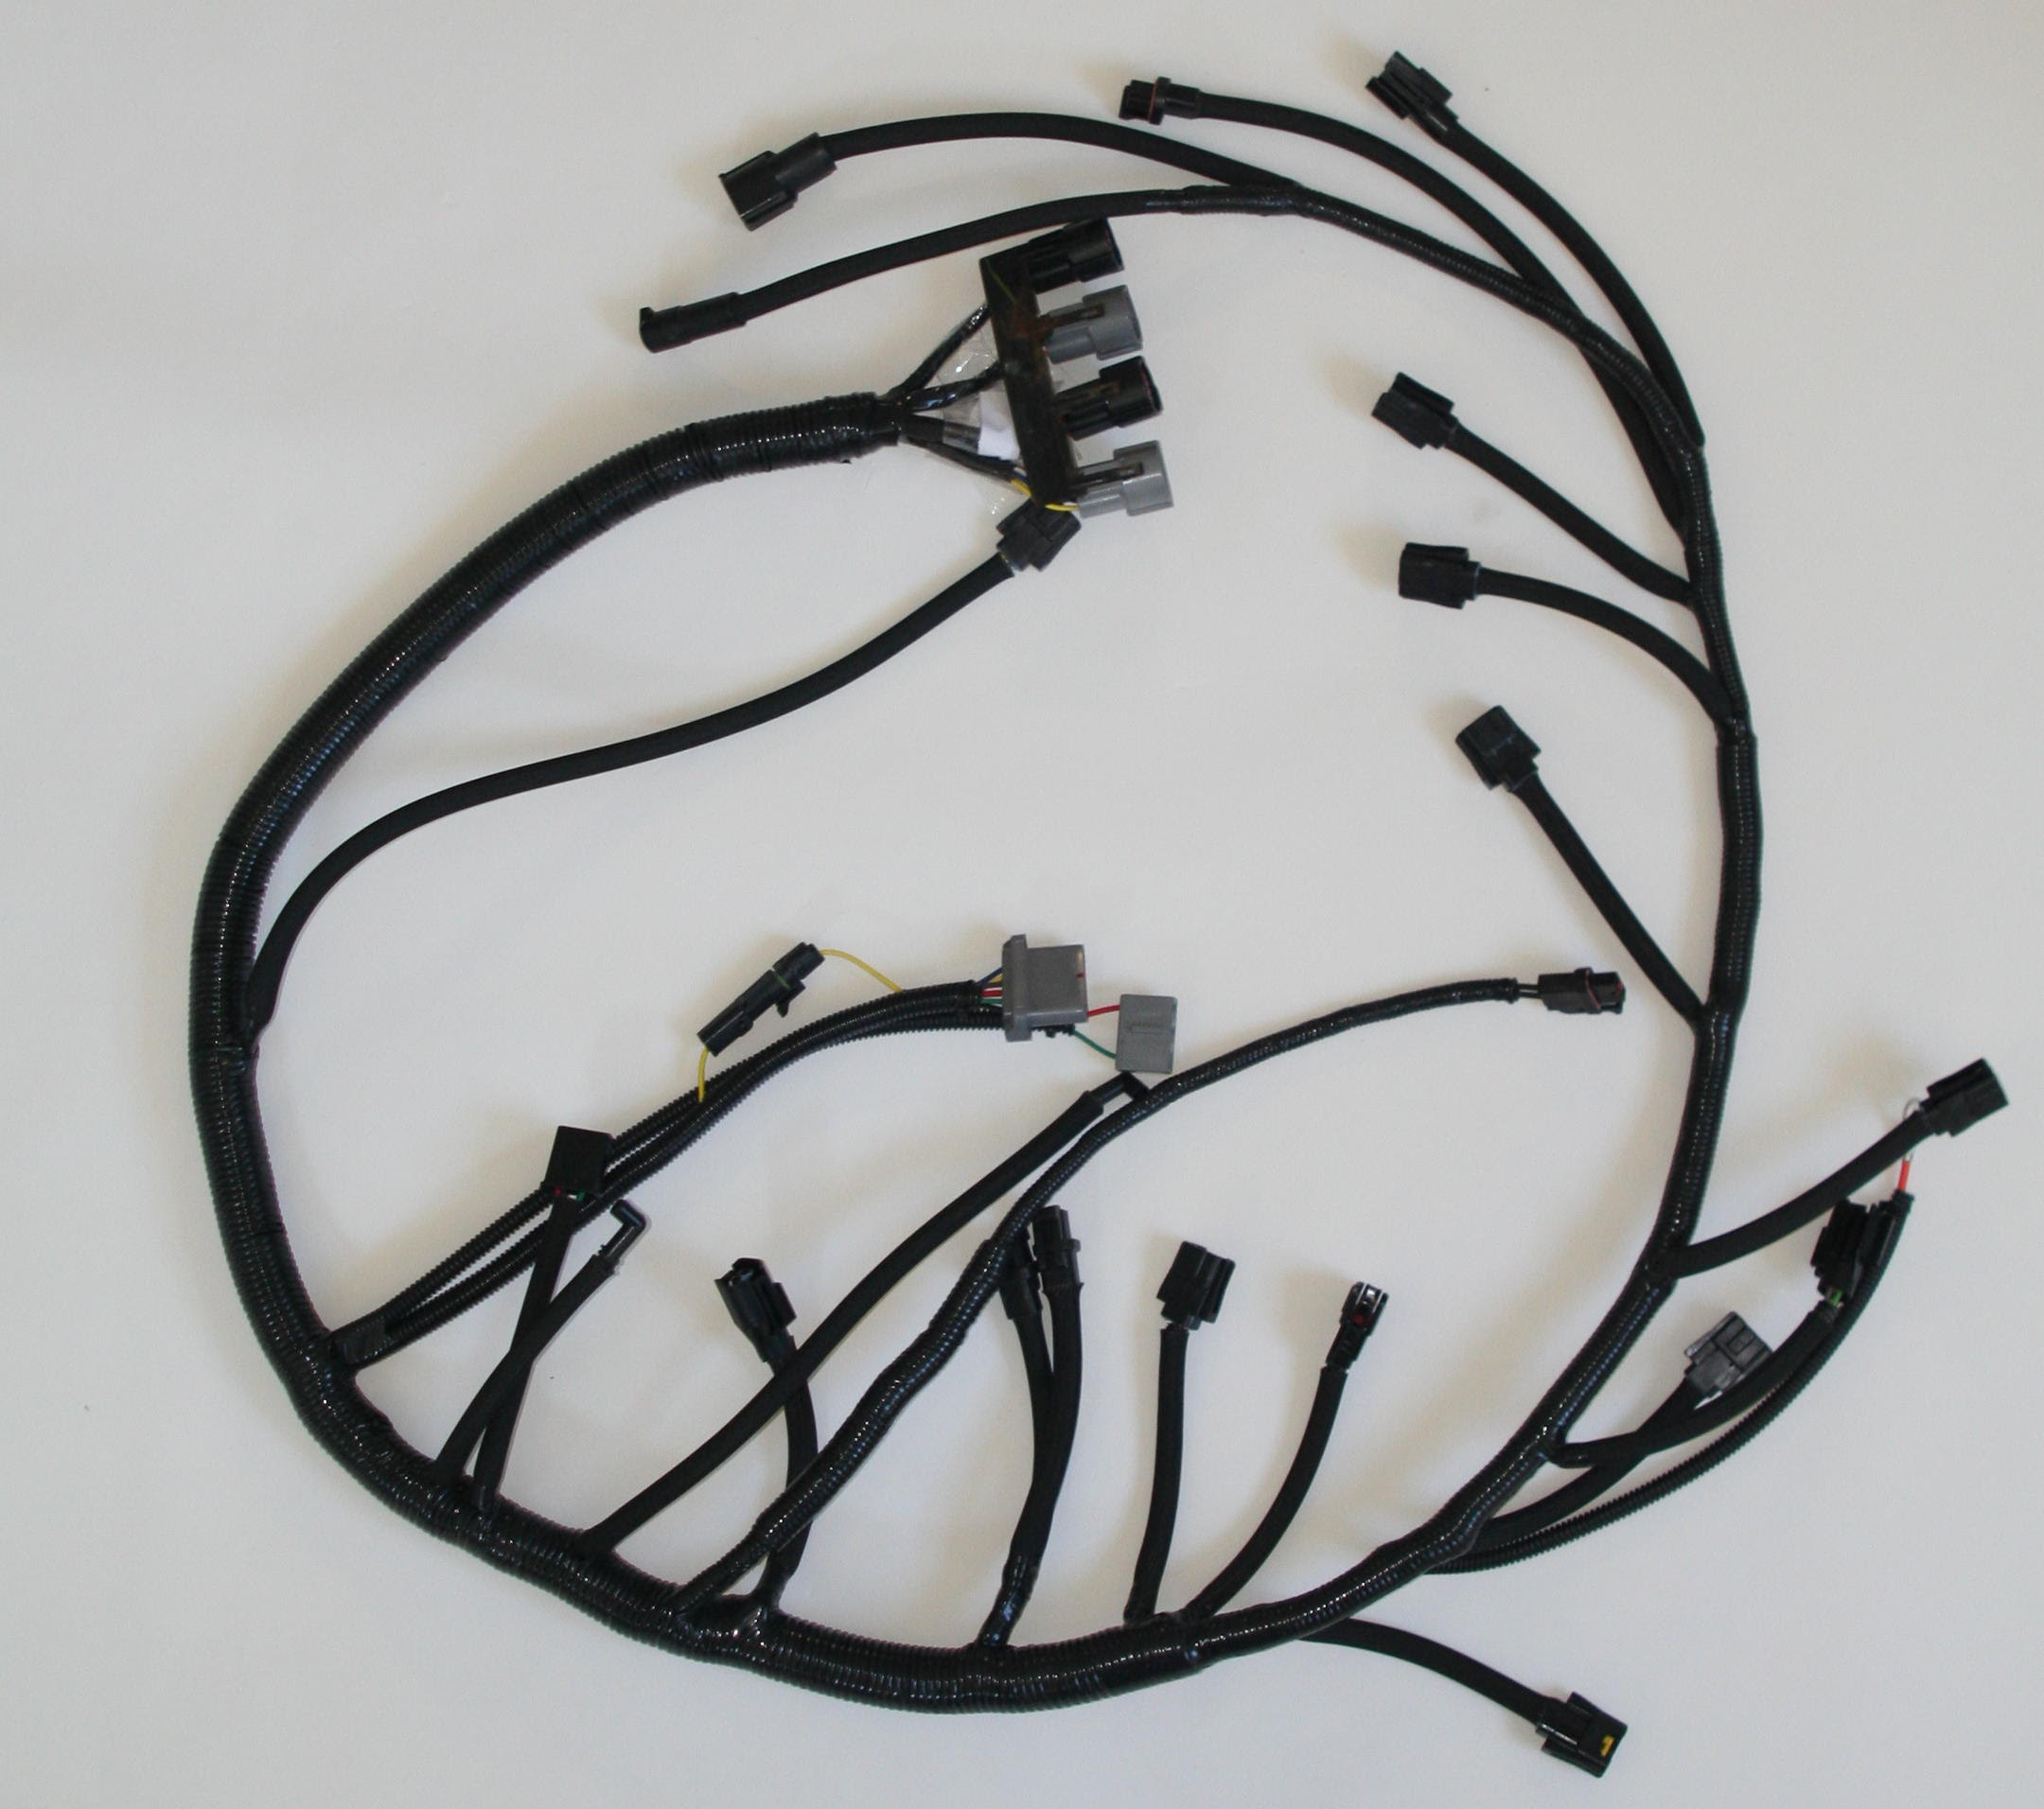 1987 Ford Bronco Wiring Harness Wiring Diagram Camaro B Camaro B Graniantichiumbri It